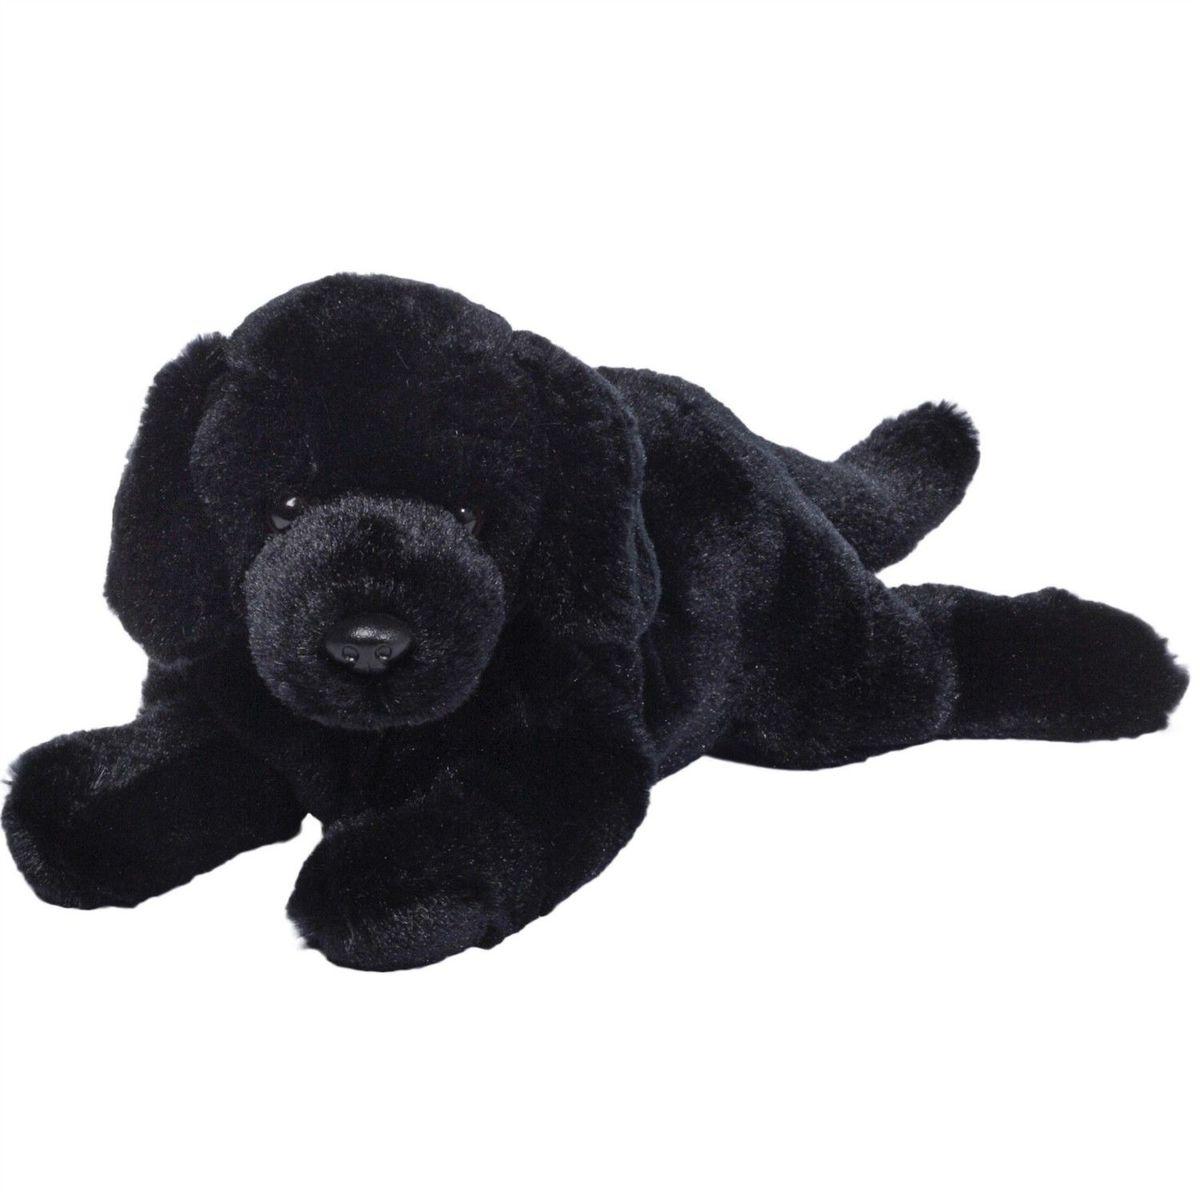 Gund Мягкая игрушка Coal 12,5 см мягкие игрушки gund игрушка мягкая itty bitty boo daisy boo 12 5 см gund